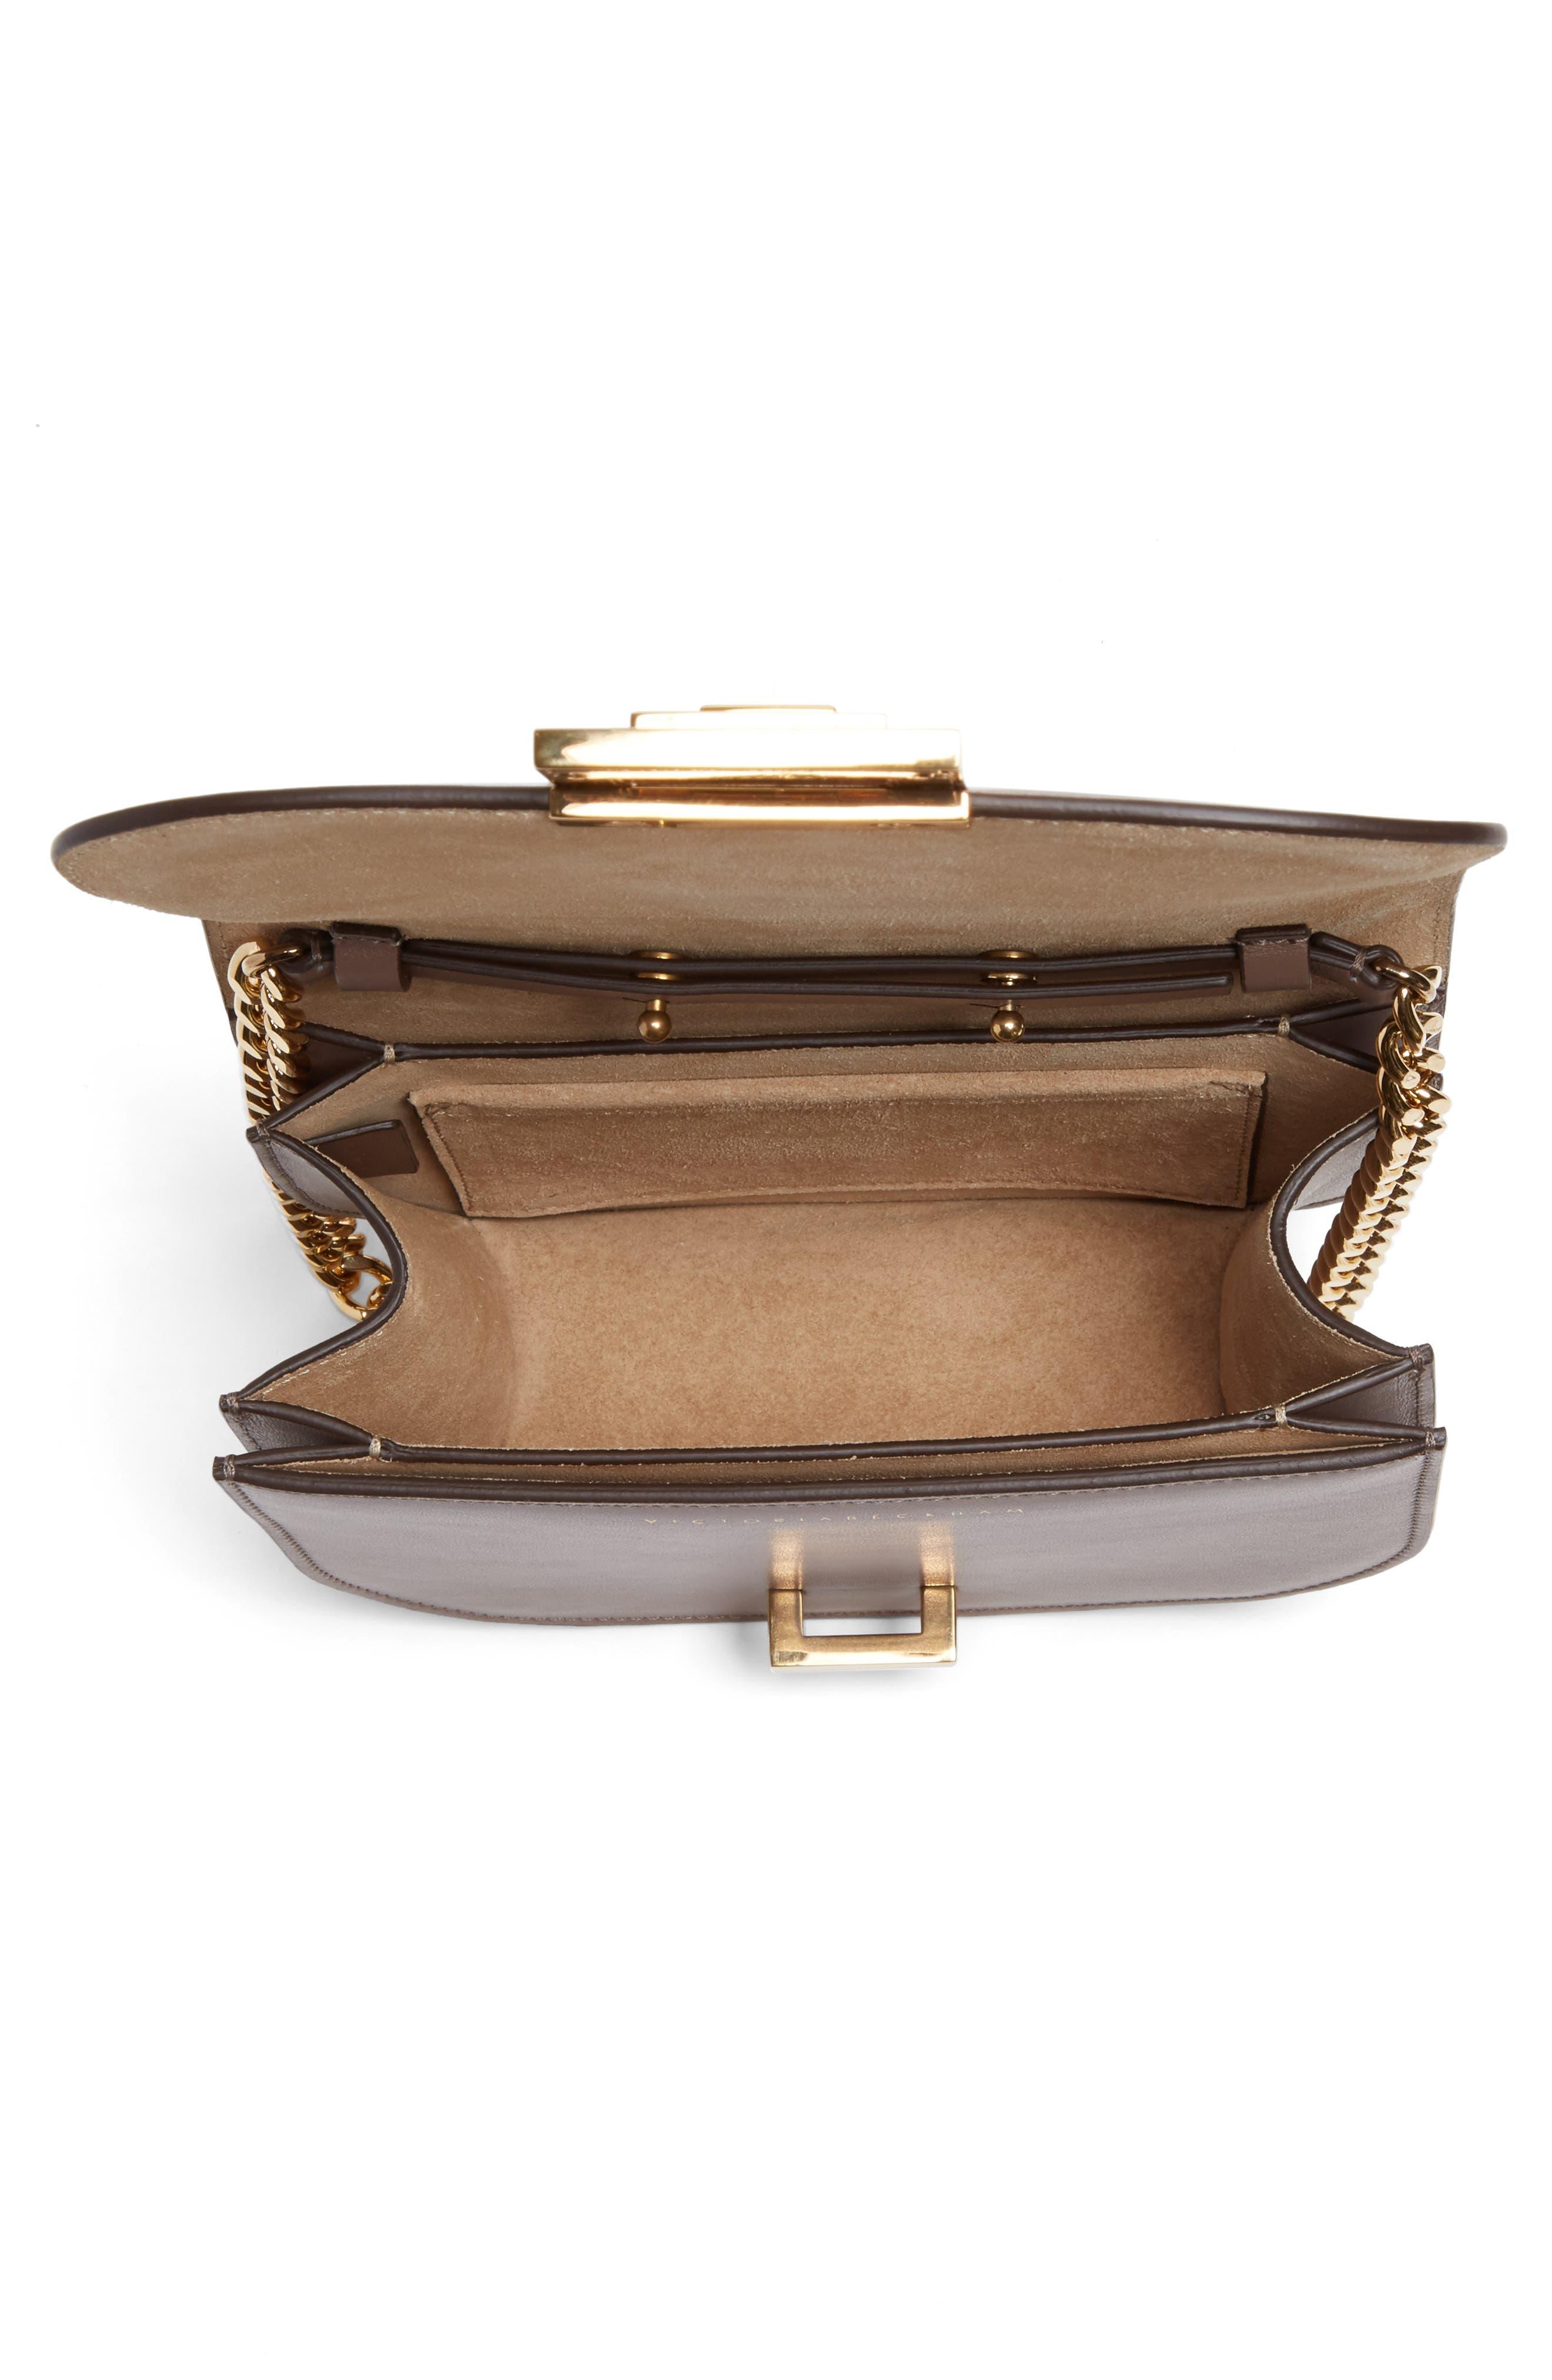 Medium Box Leather Shoulder Bag,                             Alternate thumbnail 4, color,                             200